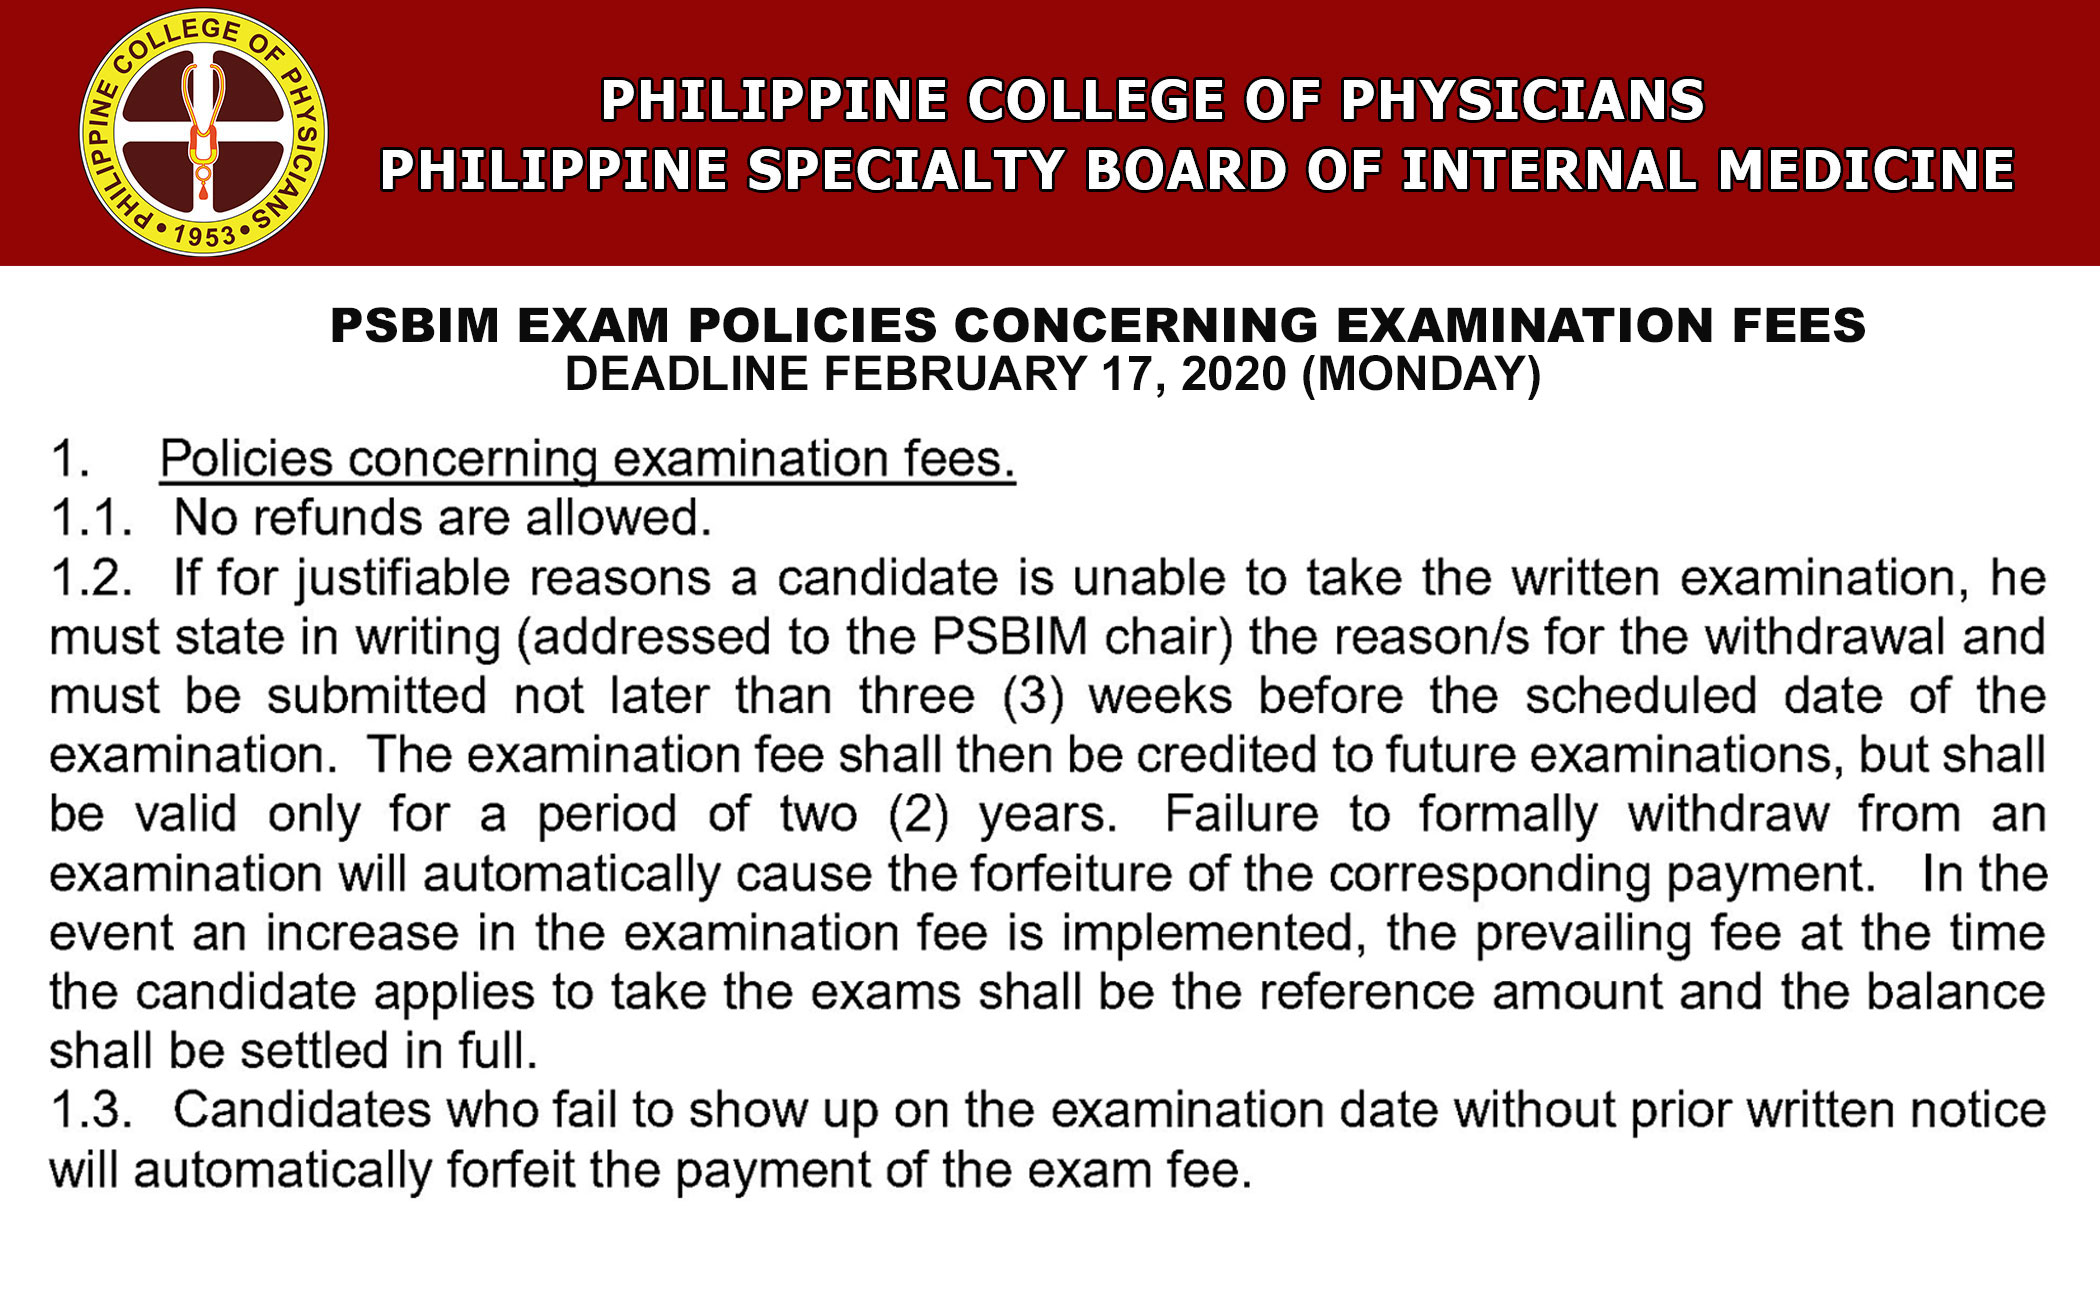 Psbim-exam-policies-concerning-examination-fees